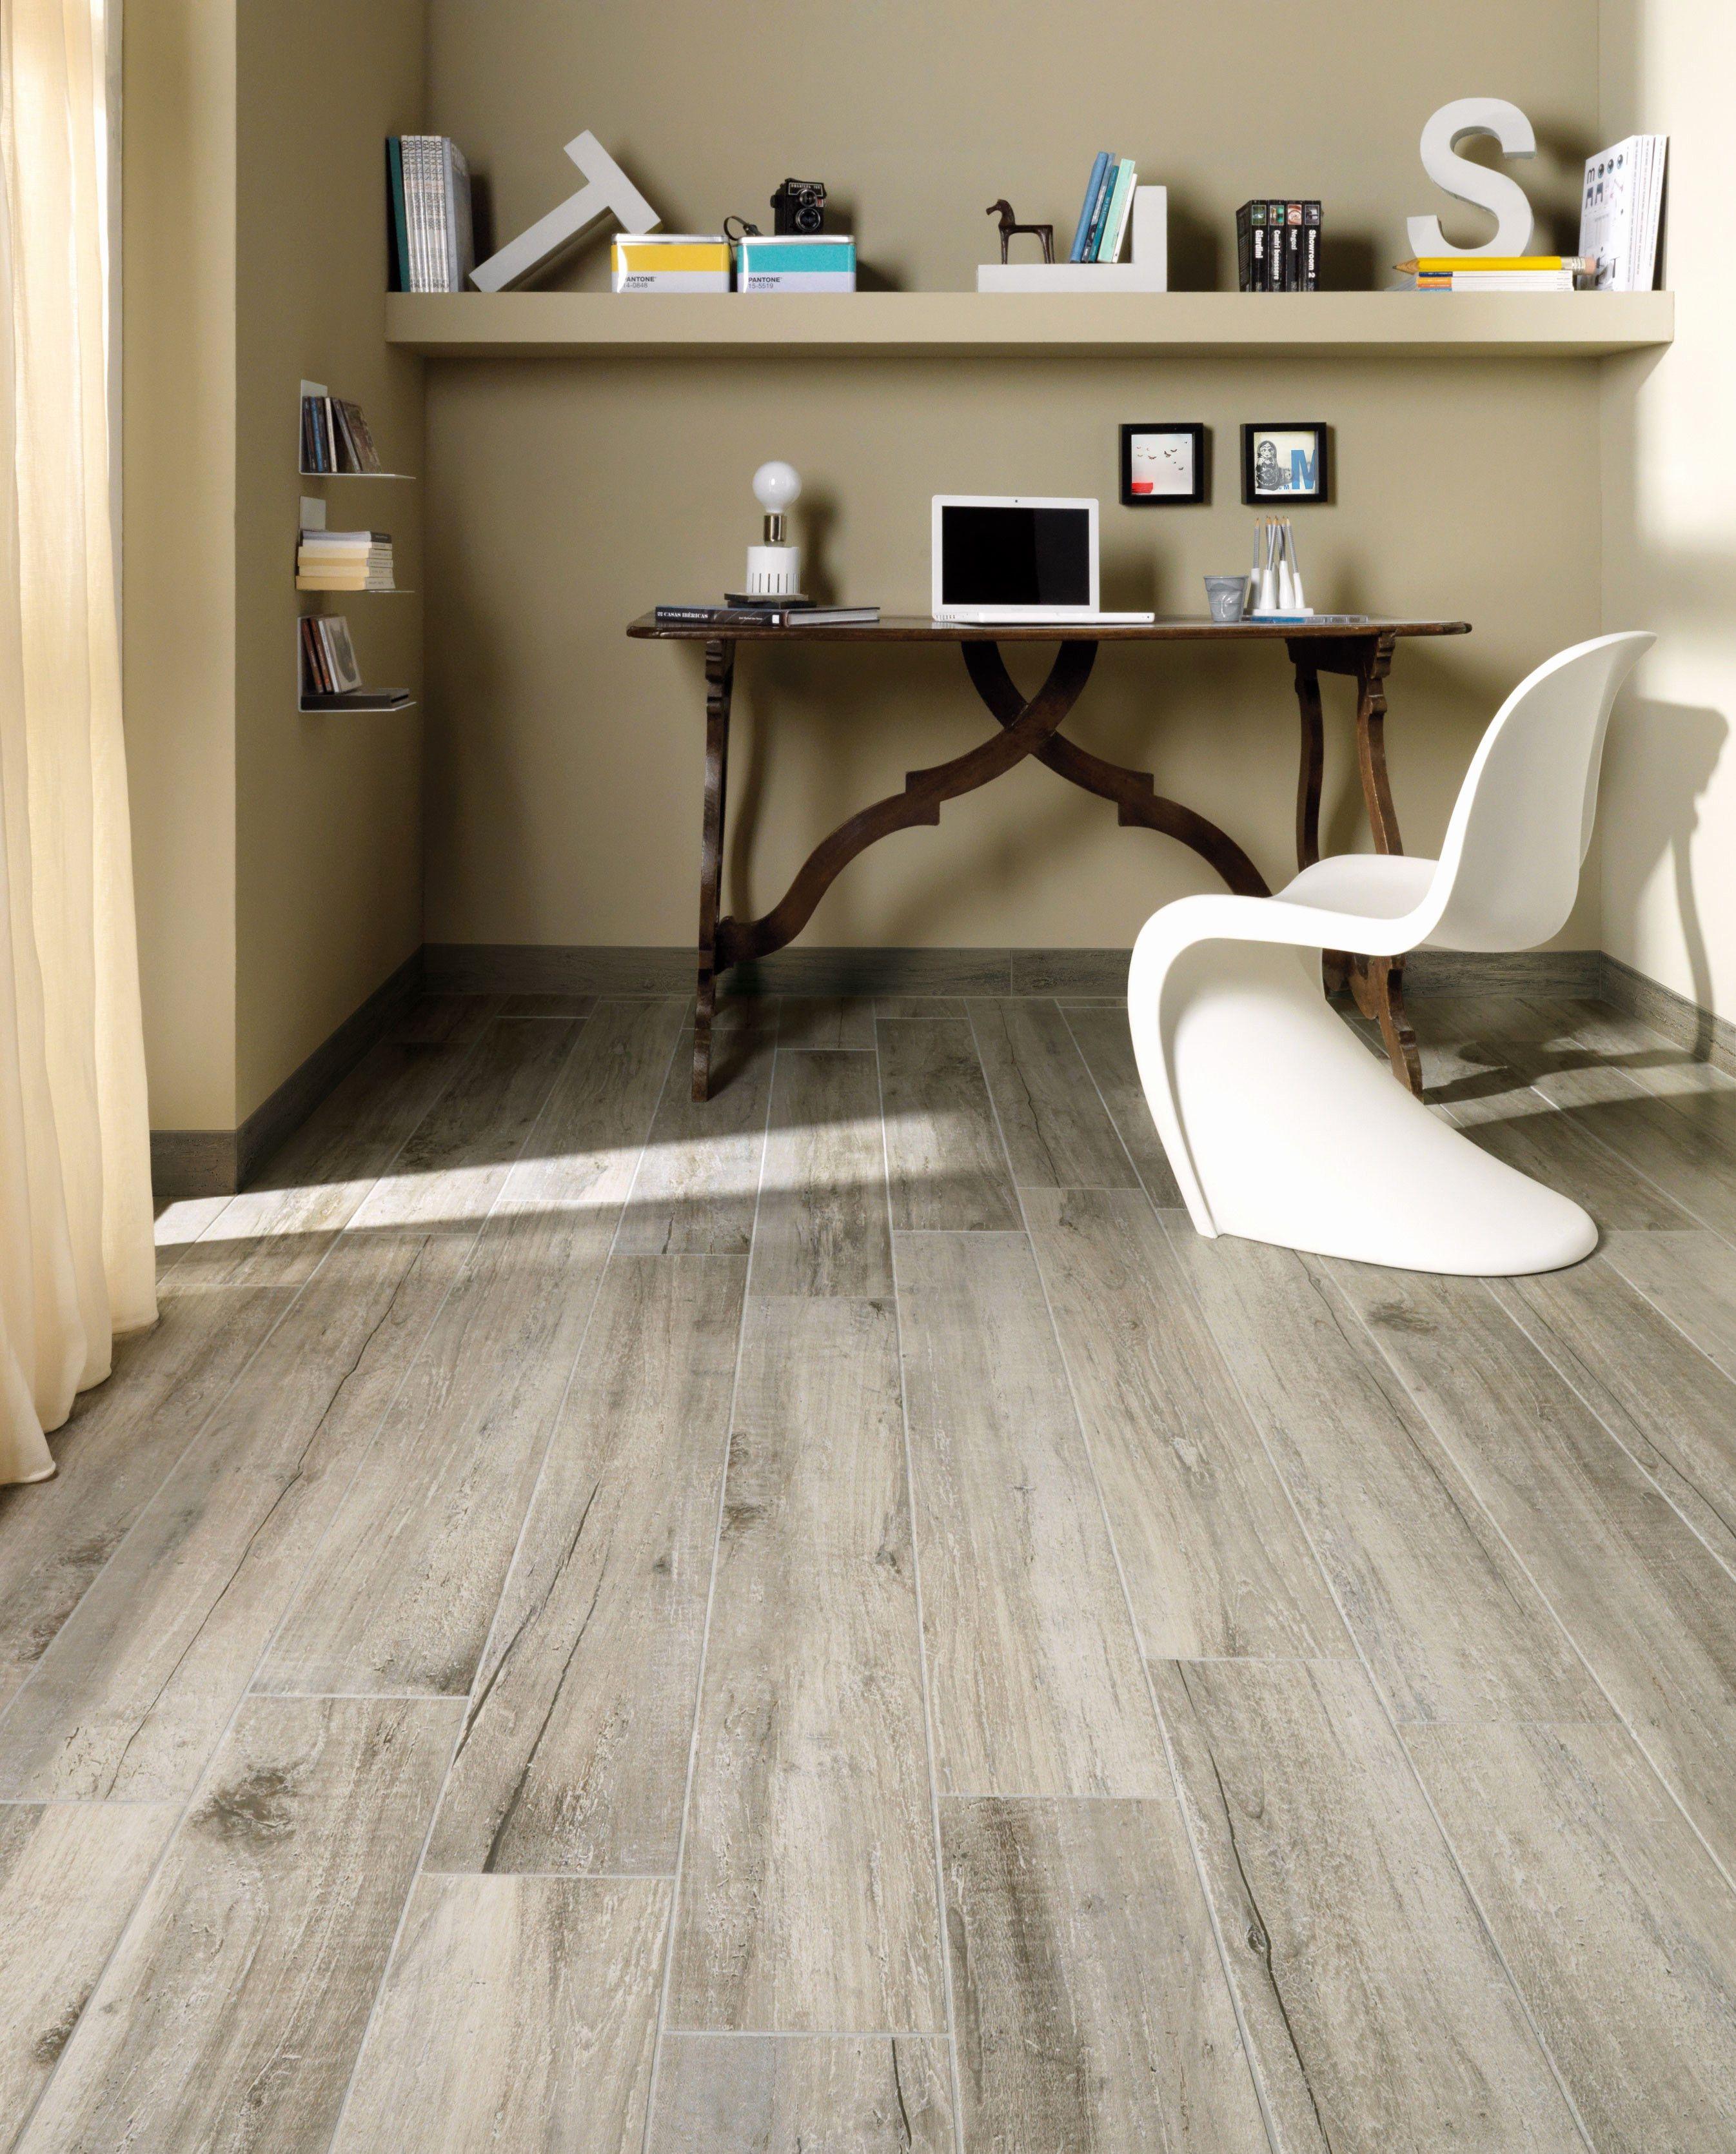 Elegant Linoleum Naturel Castorama Wood Look Tile Timber Tiles Home